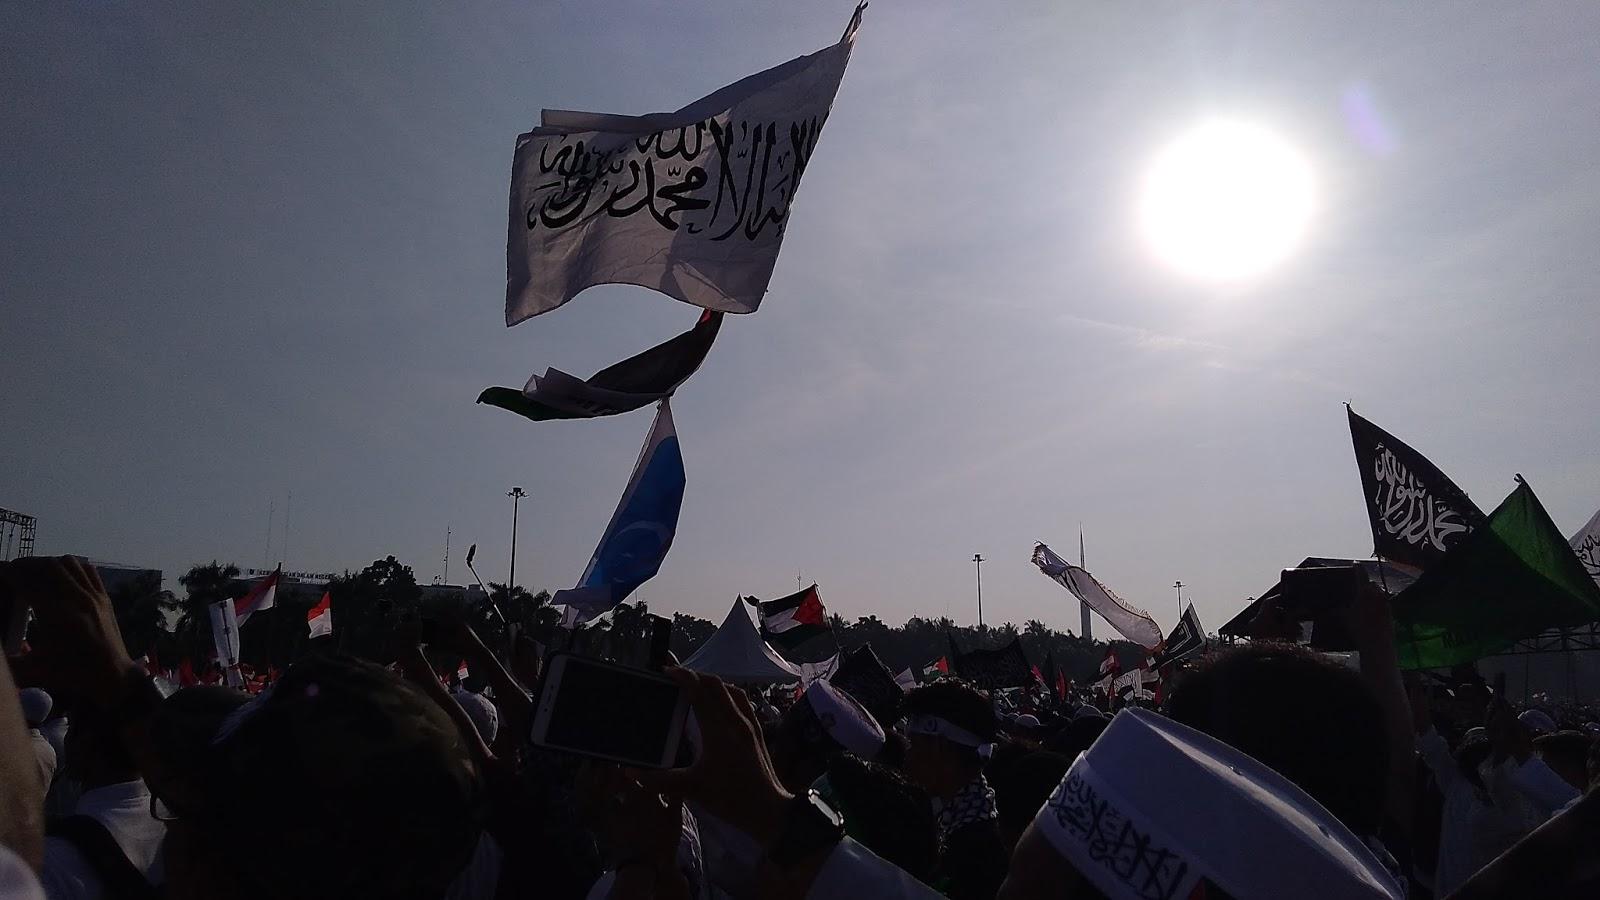 Aksi 115, Ini Doa Mengharukan Umat untuk Habib Rizieq Syihab dan Ustadz Abdul Somad